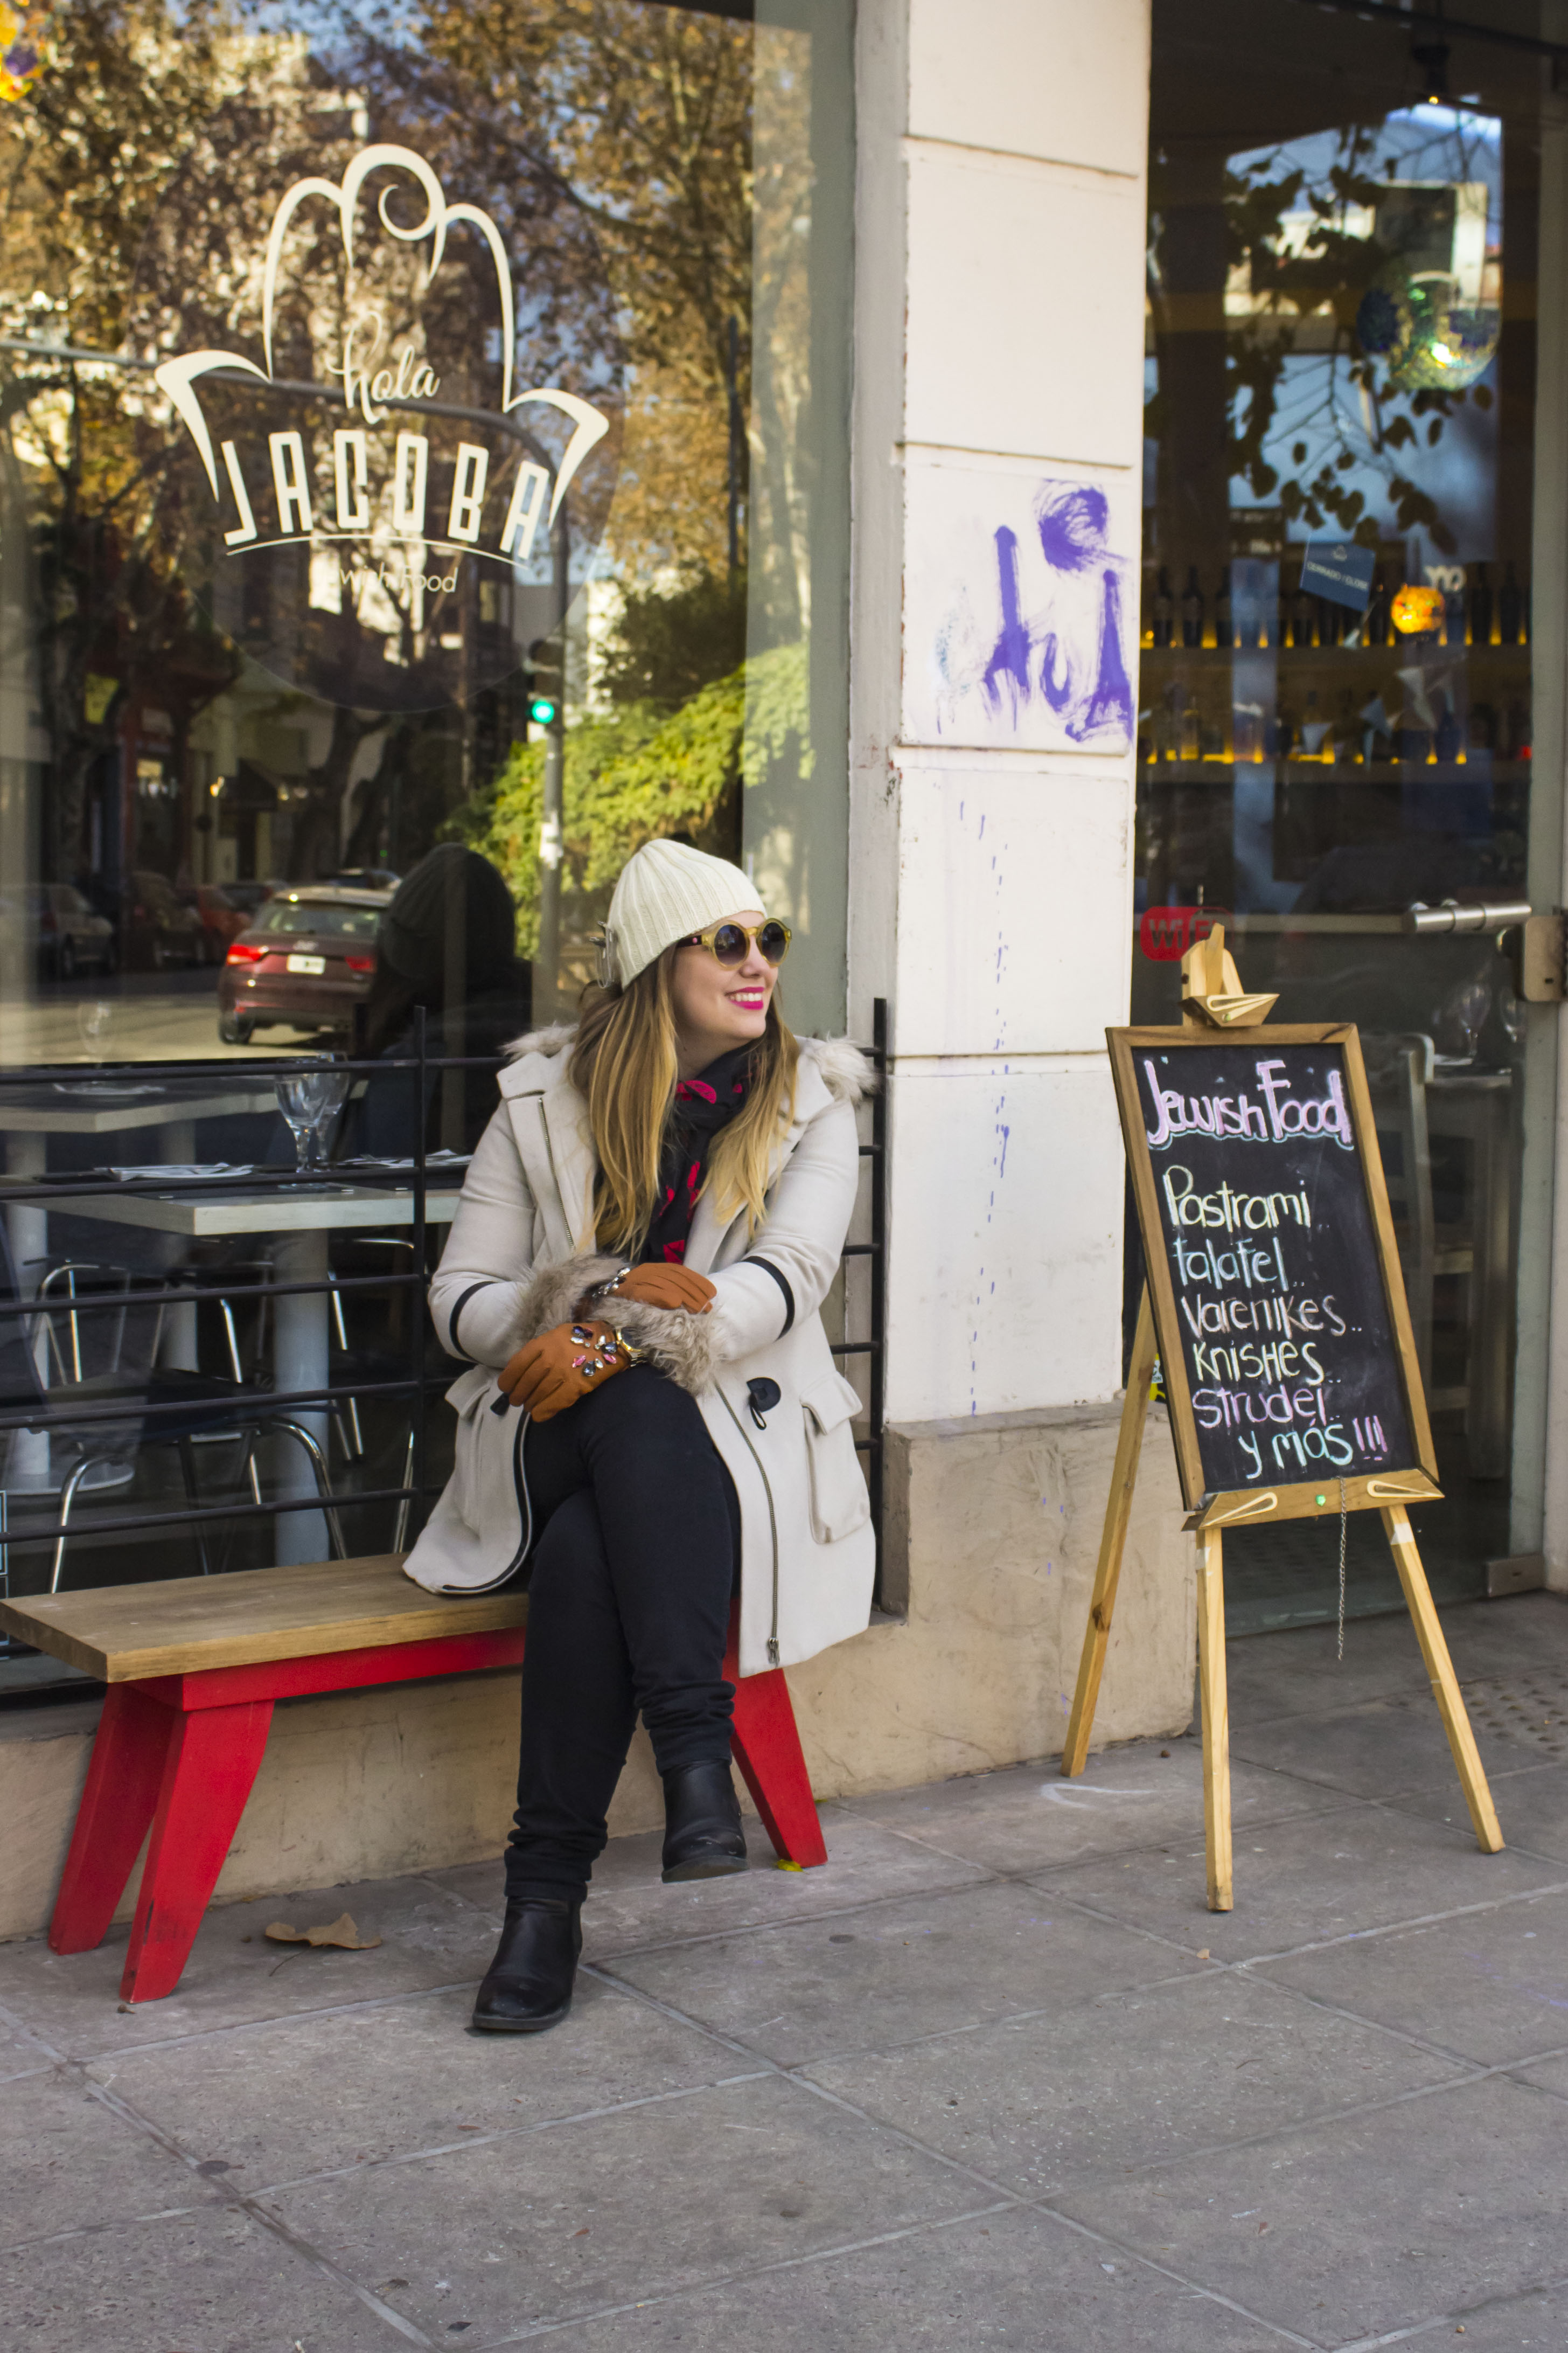 Get the look: Camisa, jeans, botas, pañuelo de besos, H&M. Reloj, Michael Kors. Anteojos de sol, Infinit. Sweater, Koxis. Guantes, Zara. Broche en gorrito, Mes Lubies.